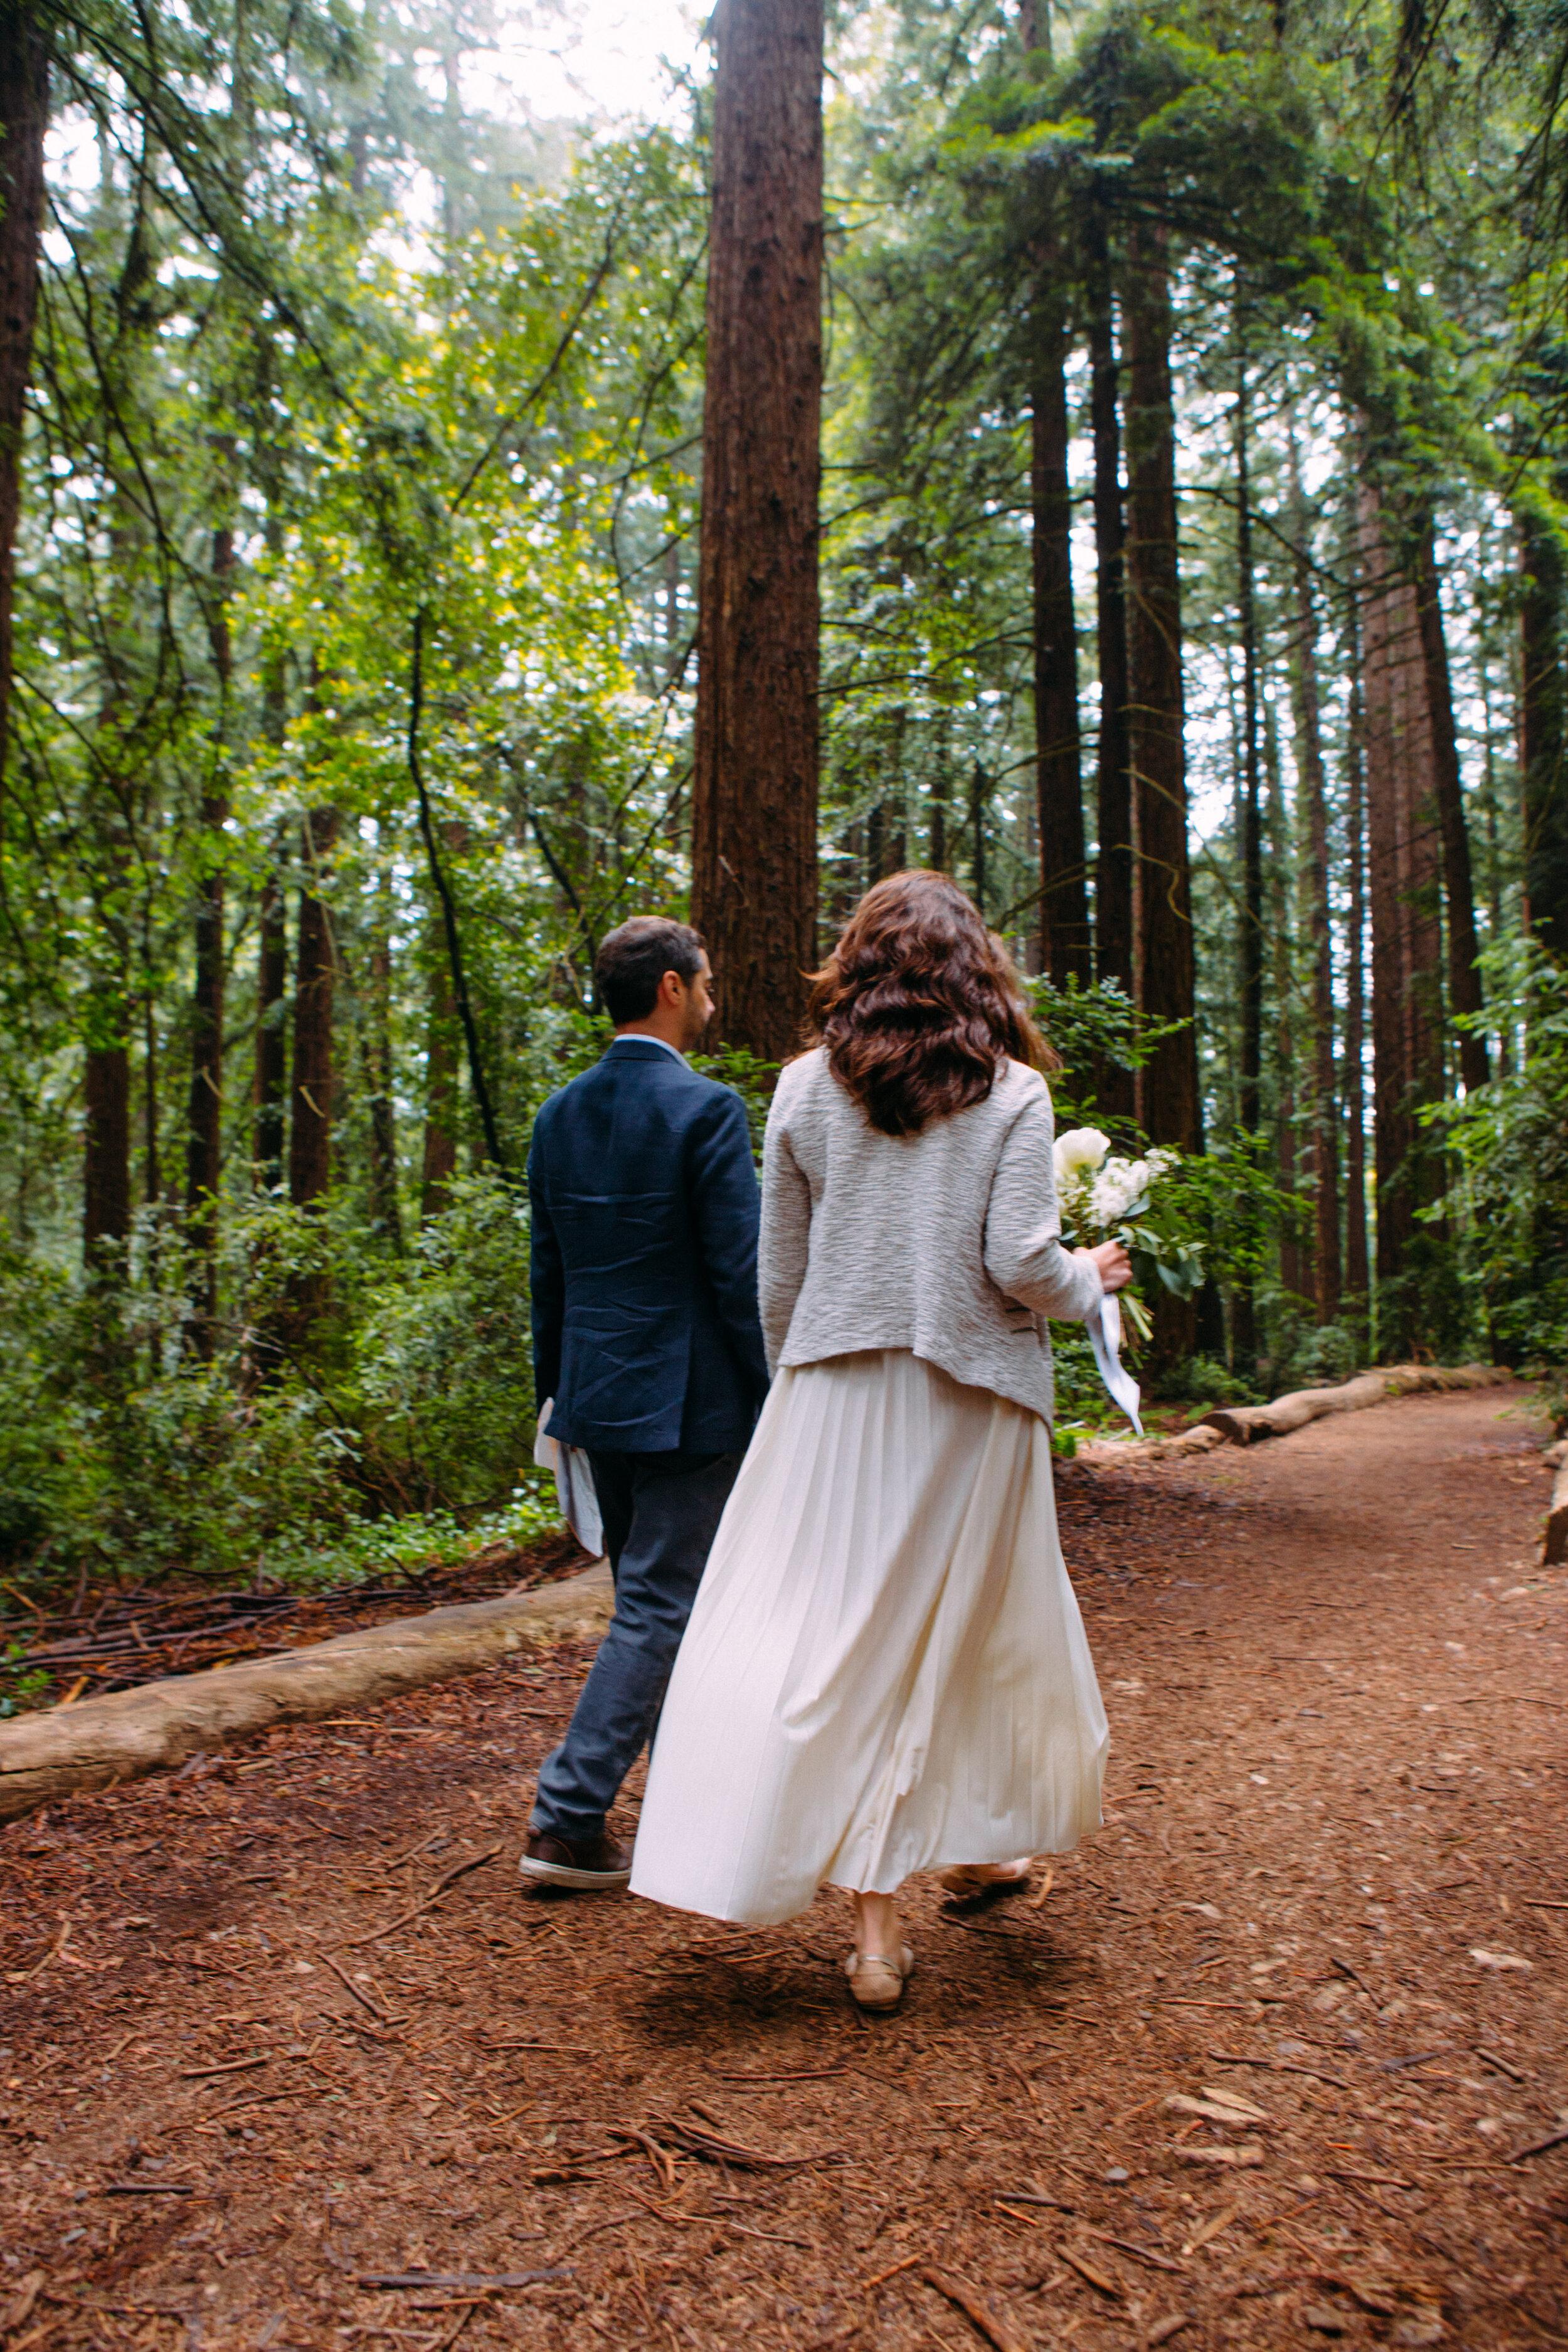 20190716-San Francisco-Redwood Regional Park-Marcella Daniele--4.jpg